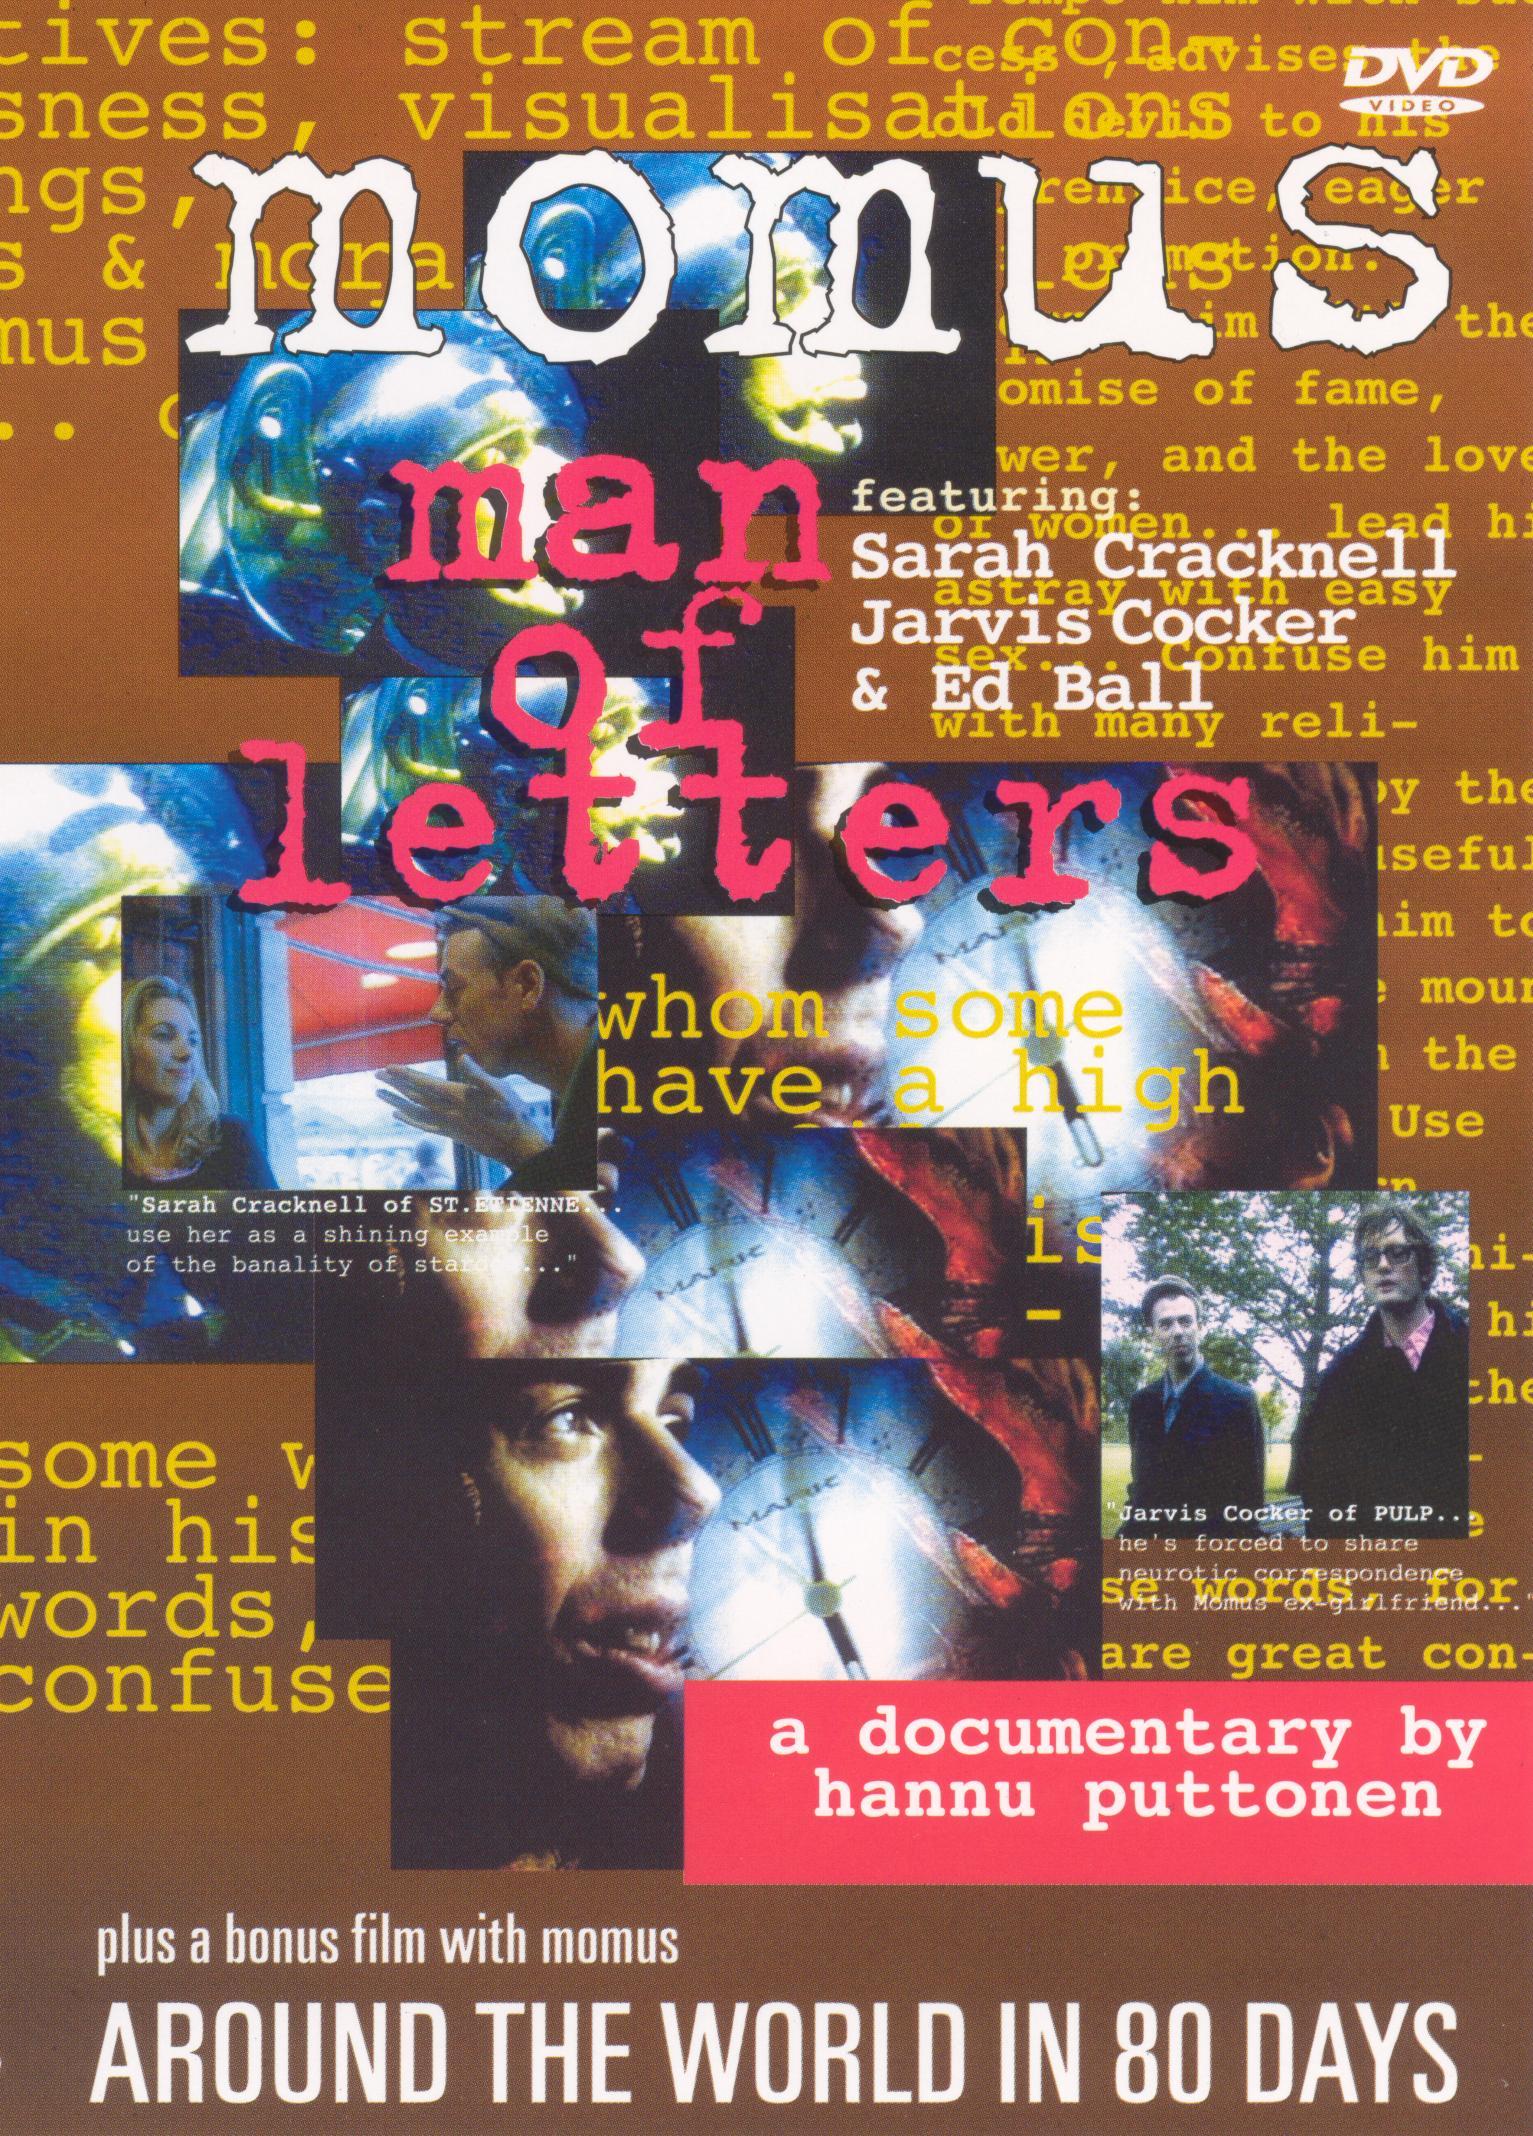 Momus: Man of Letters (2003)